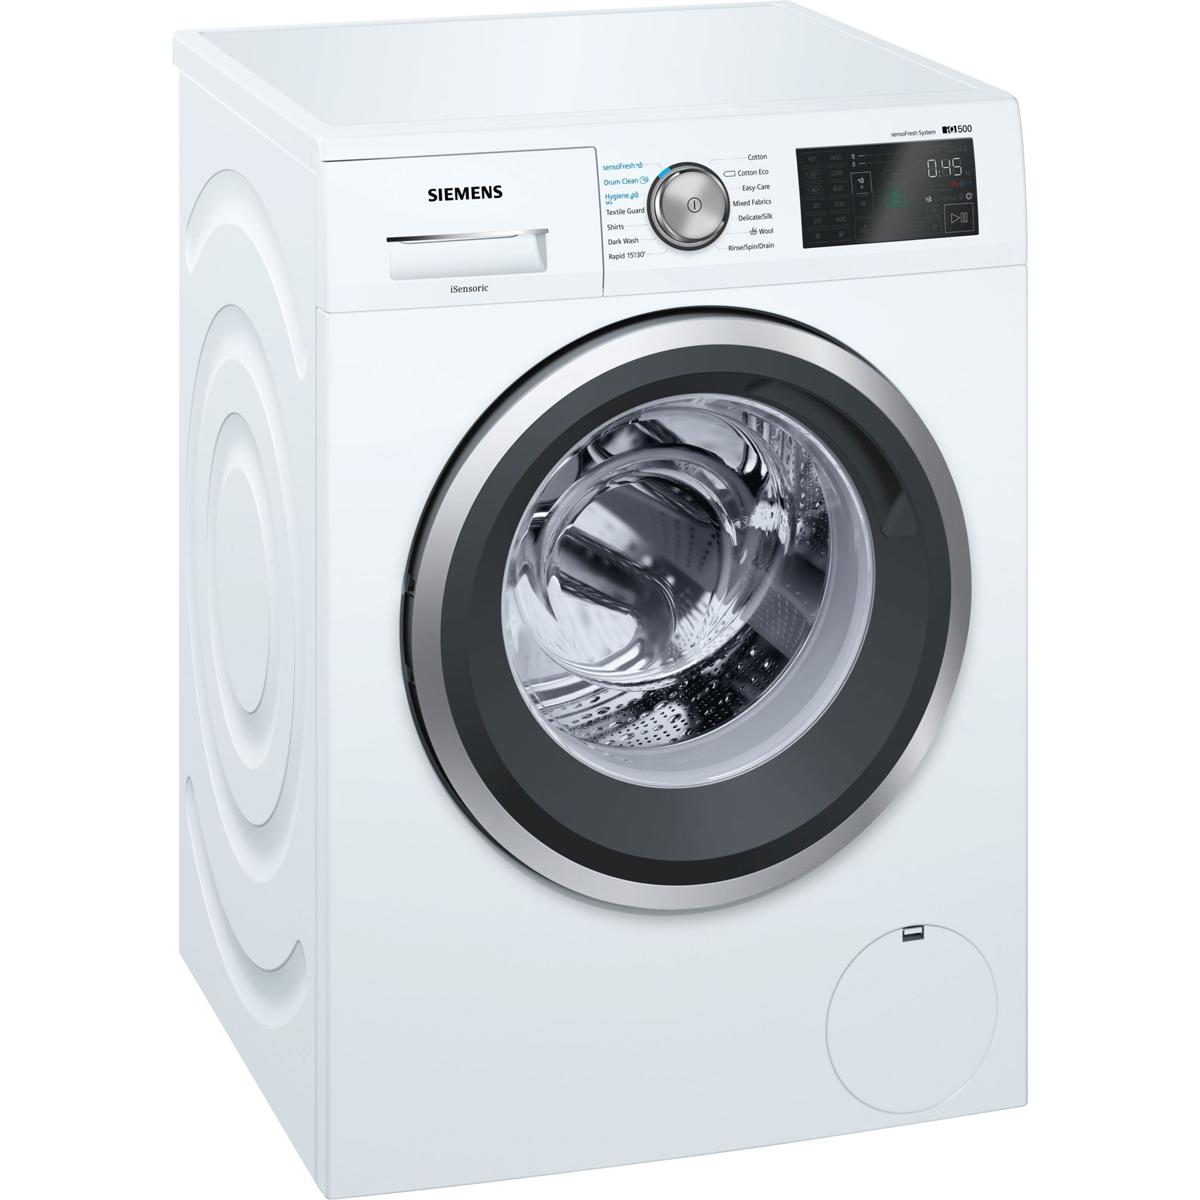 Siemens iQ500 WM14T790GB Washing Machine Freestanding 9 kg A+++ White